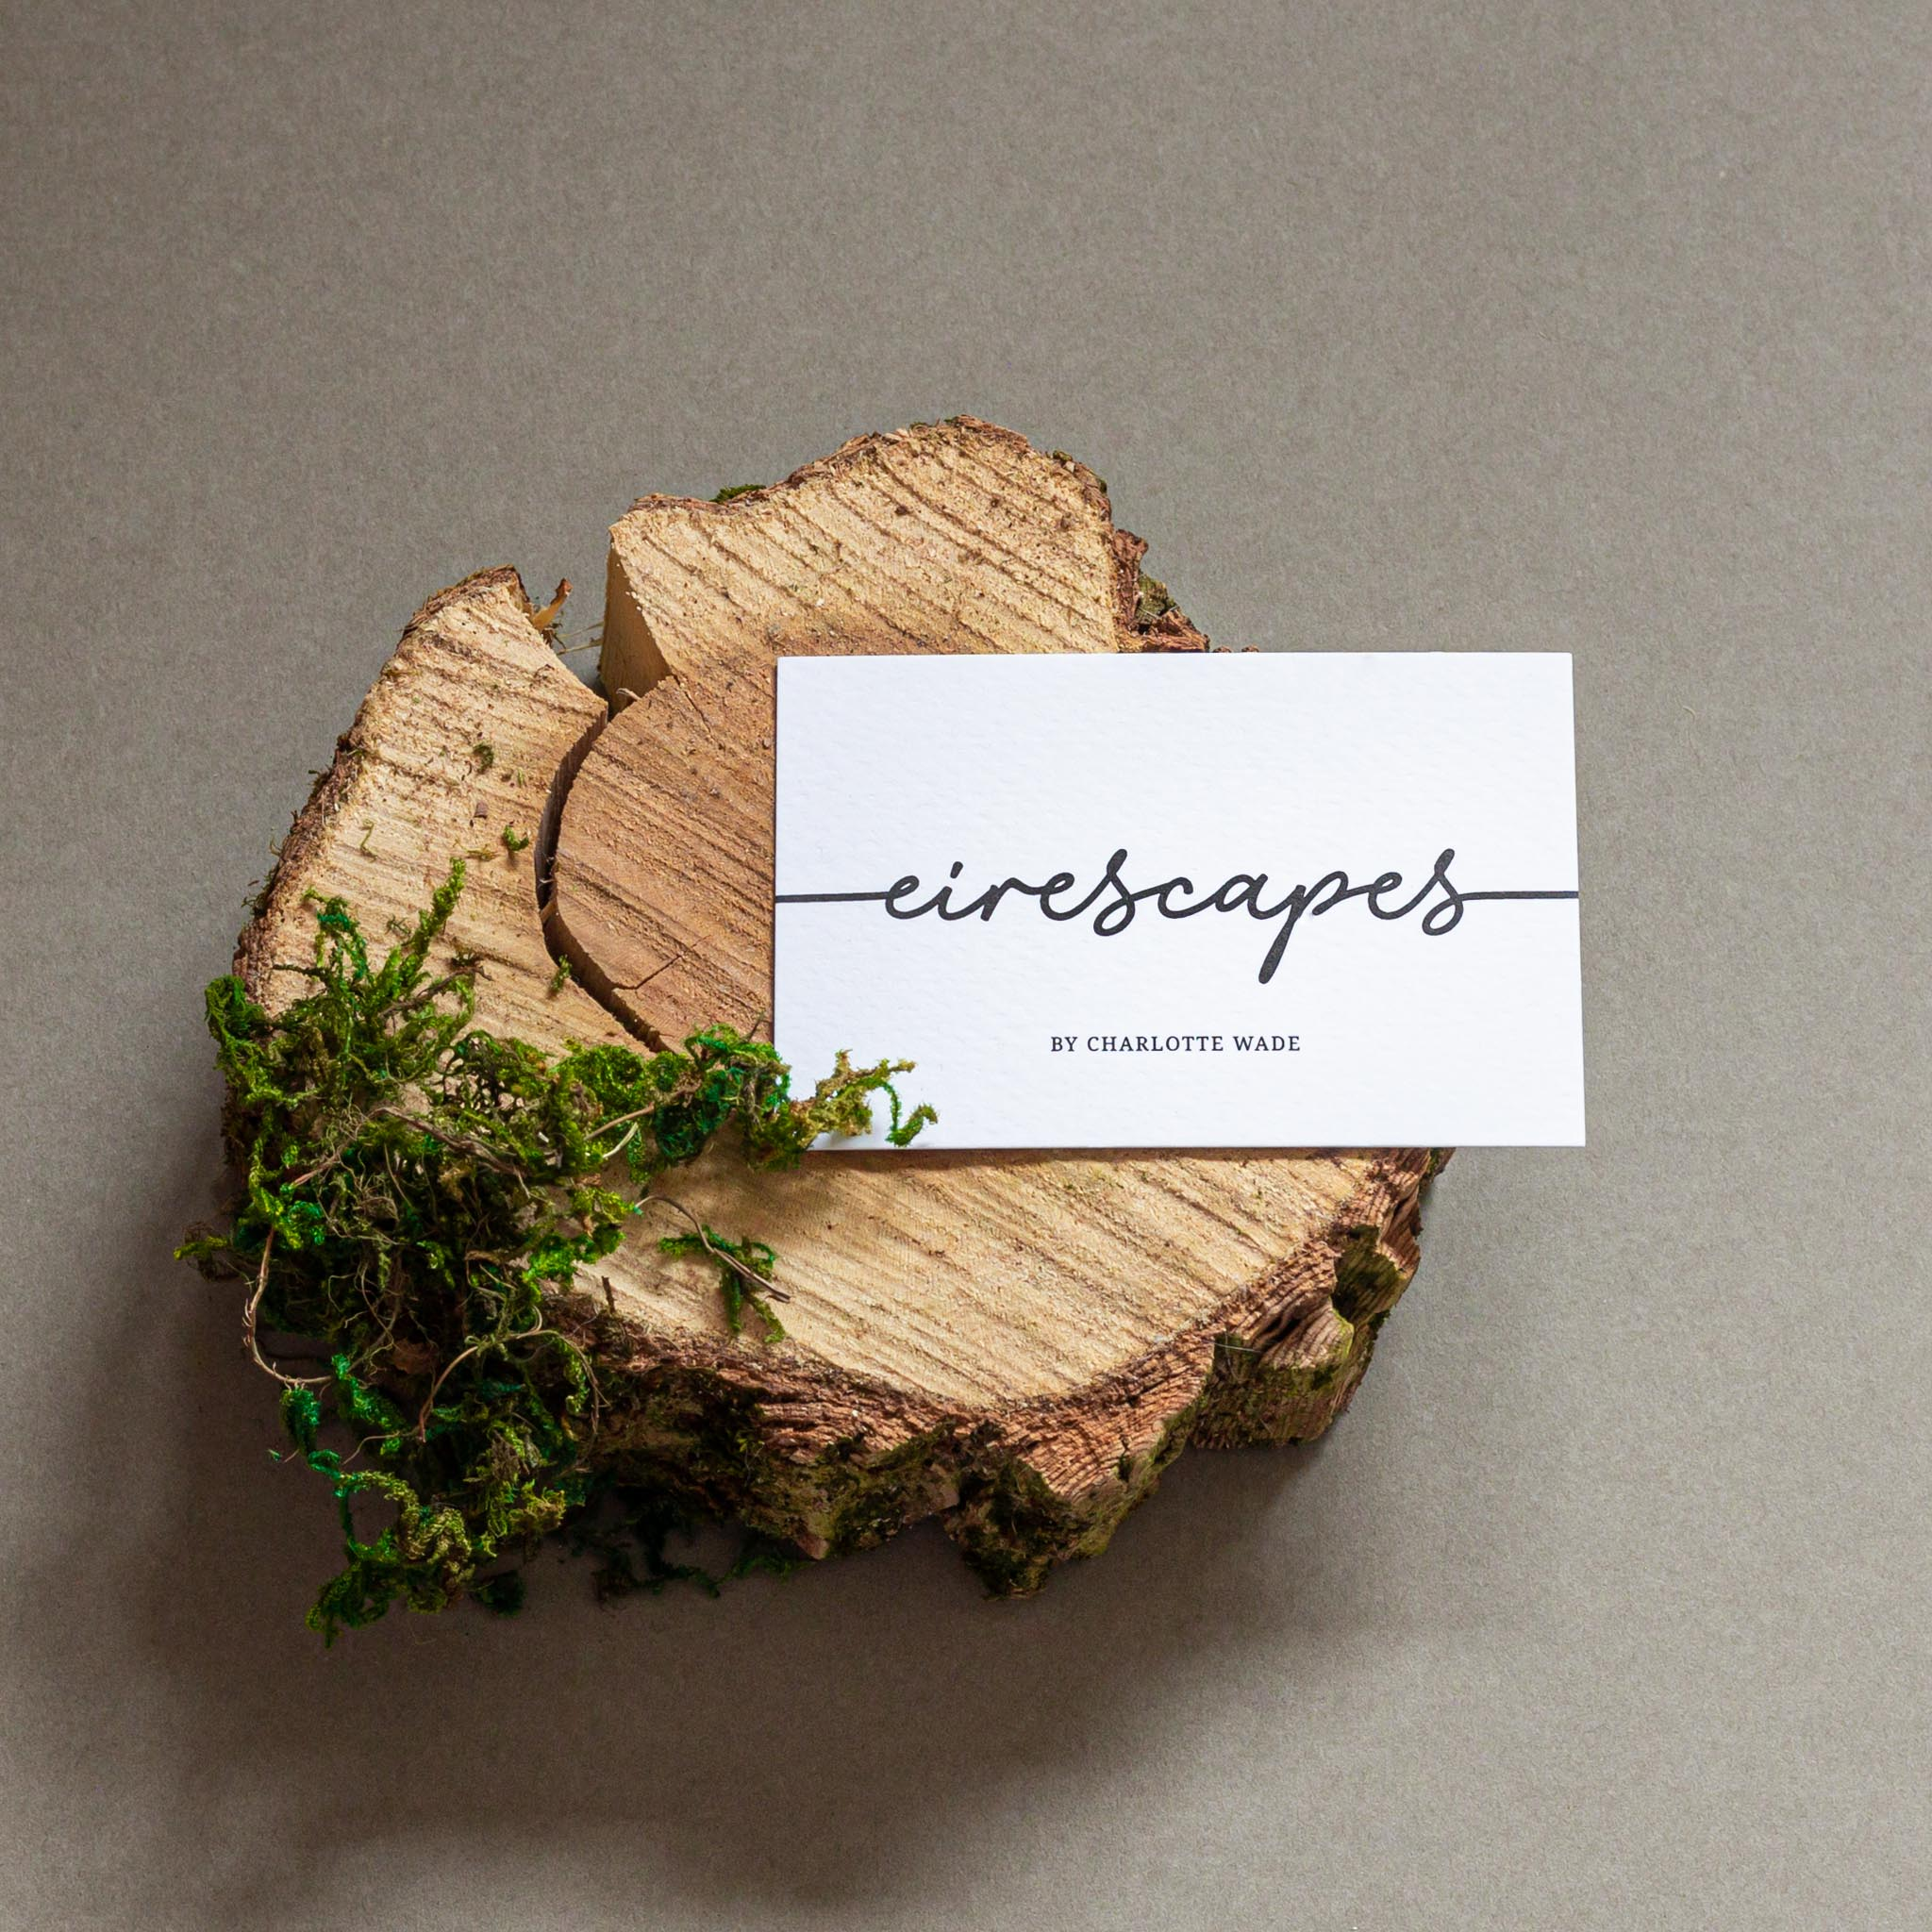 Landscape Photographer Creates Nature Inspired Brand Identity